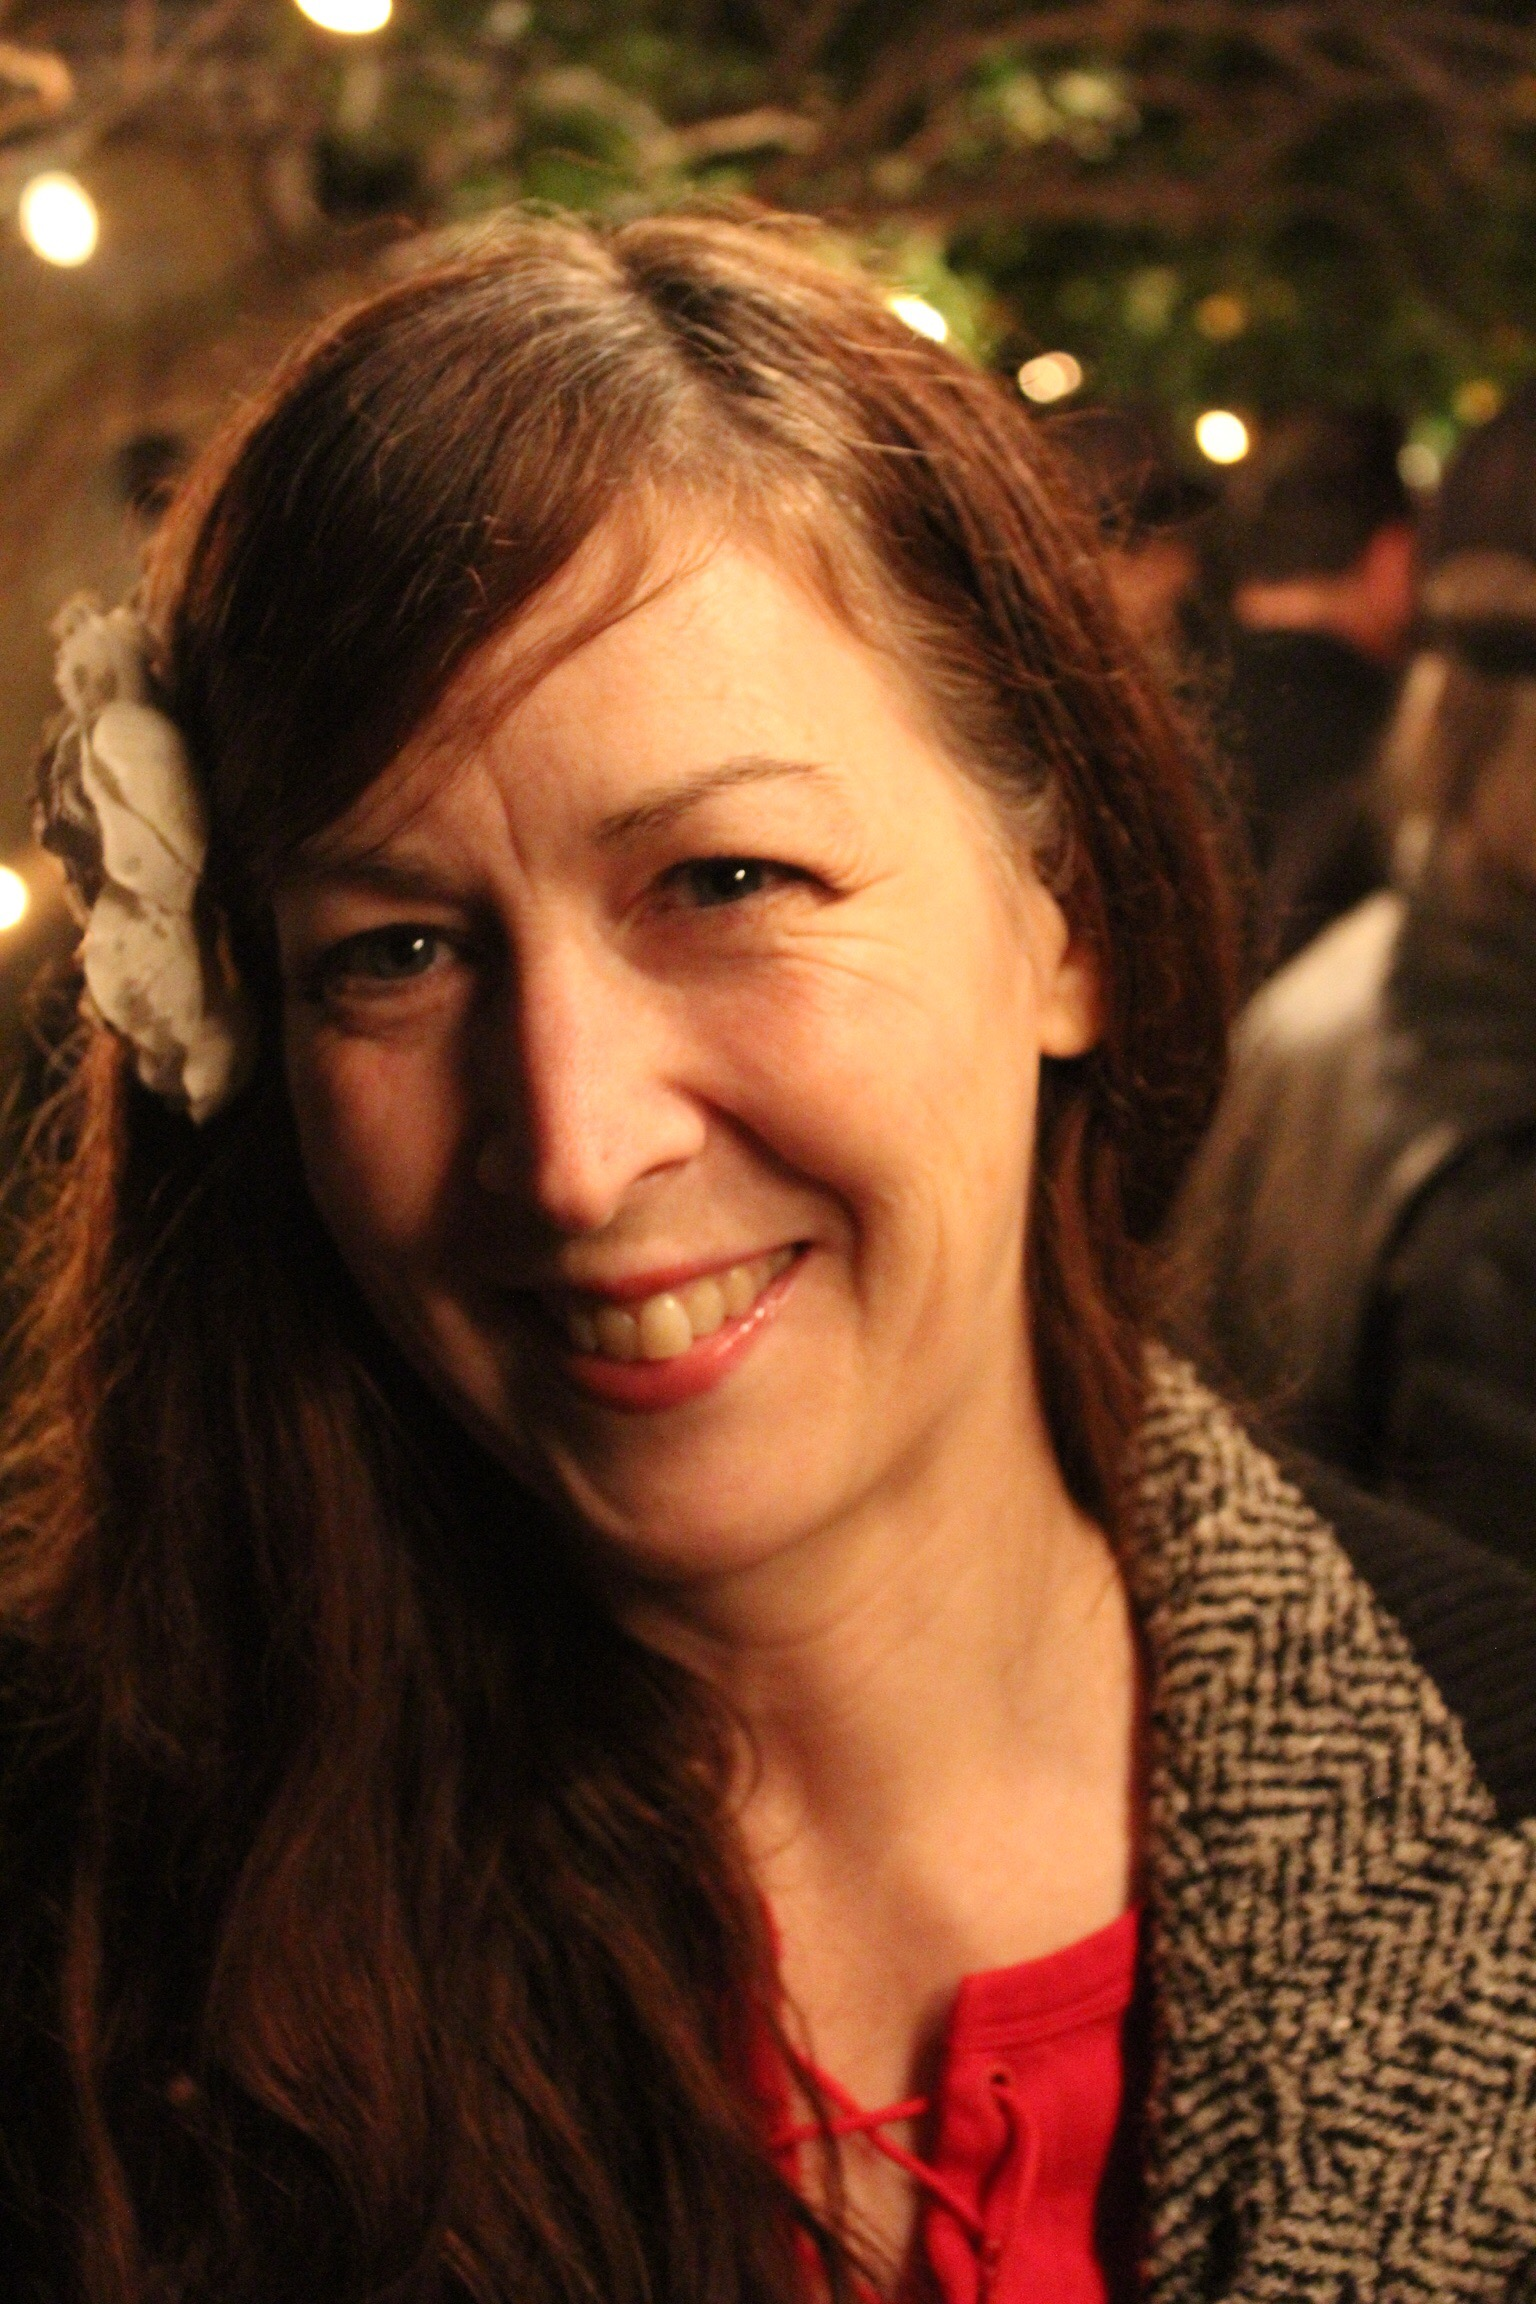 Suzanne O'Keeffe